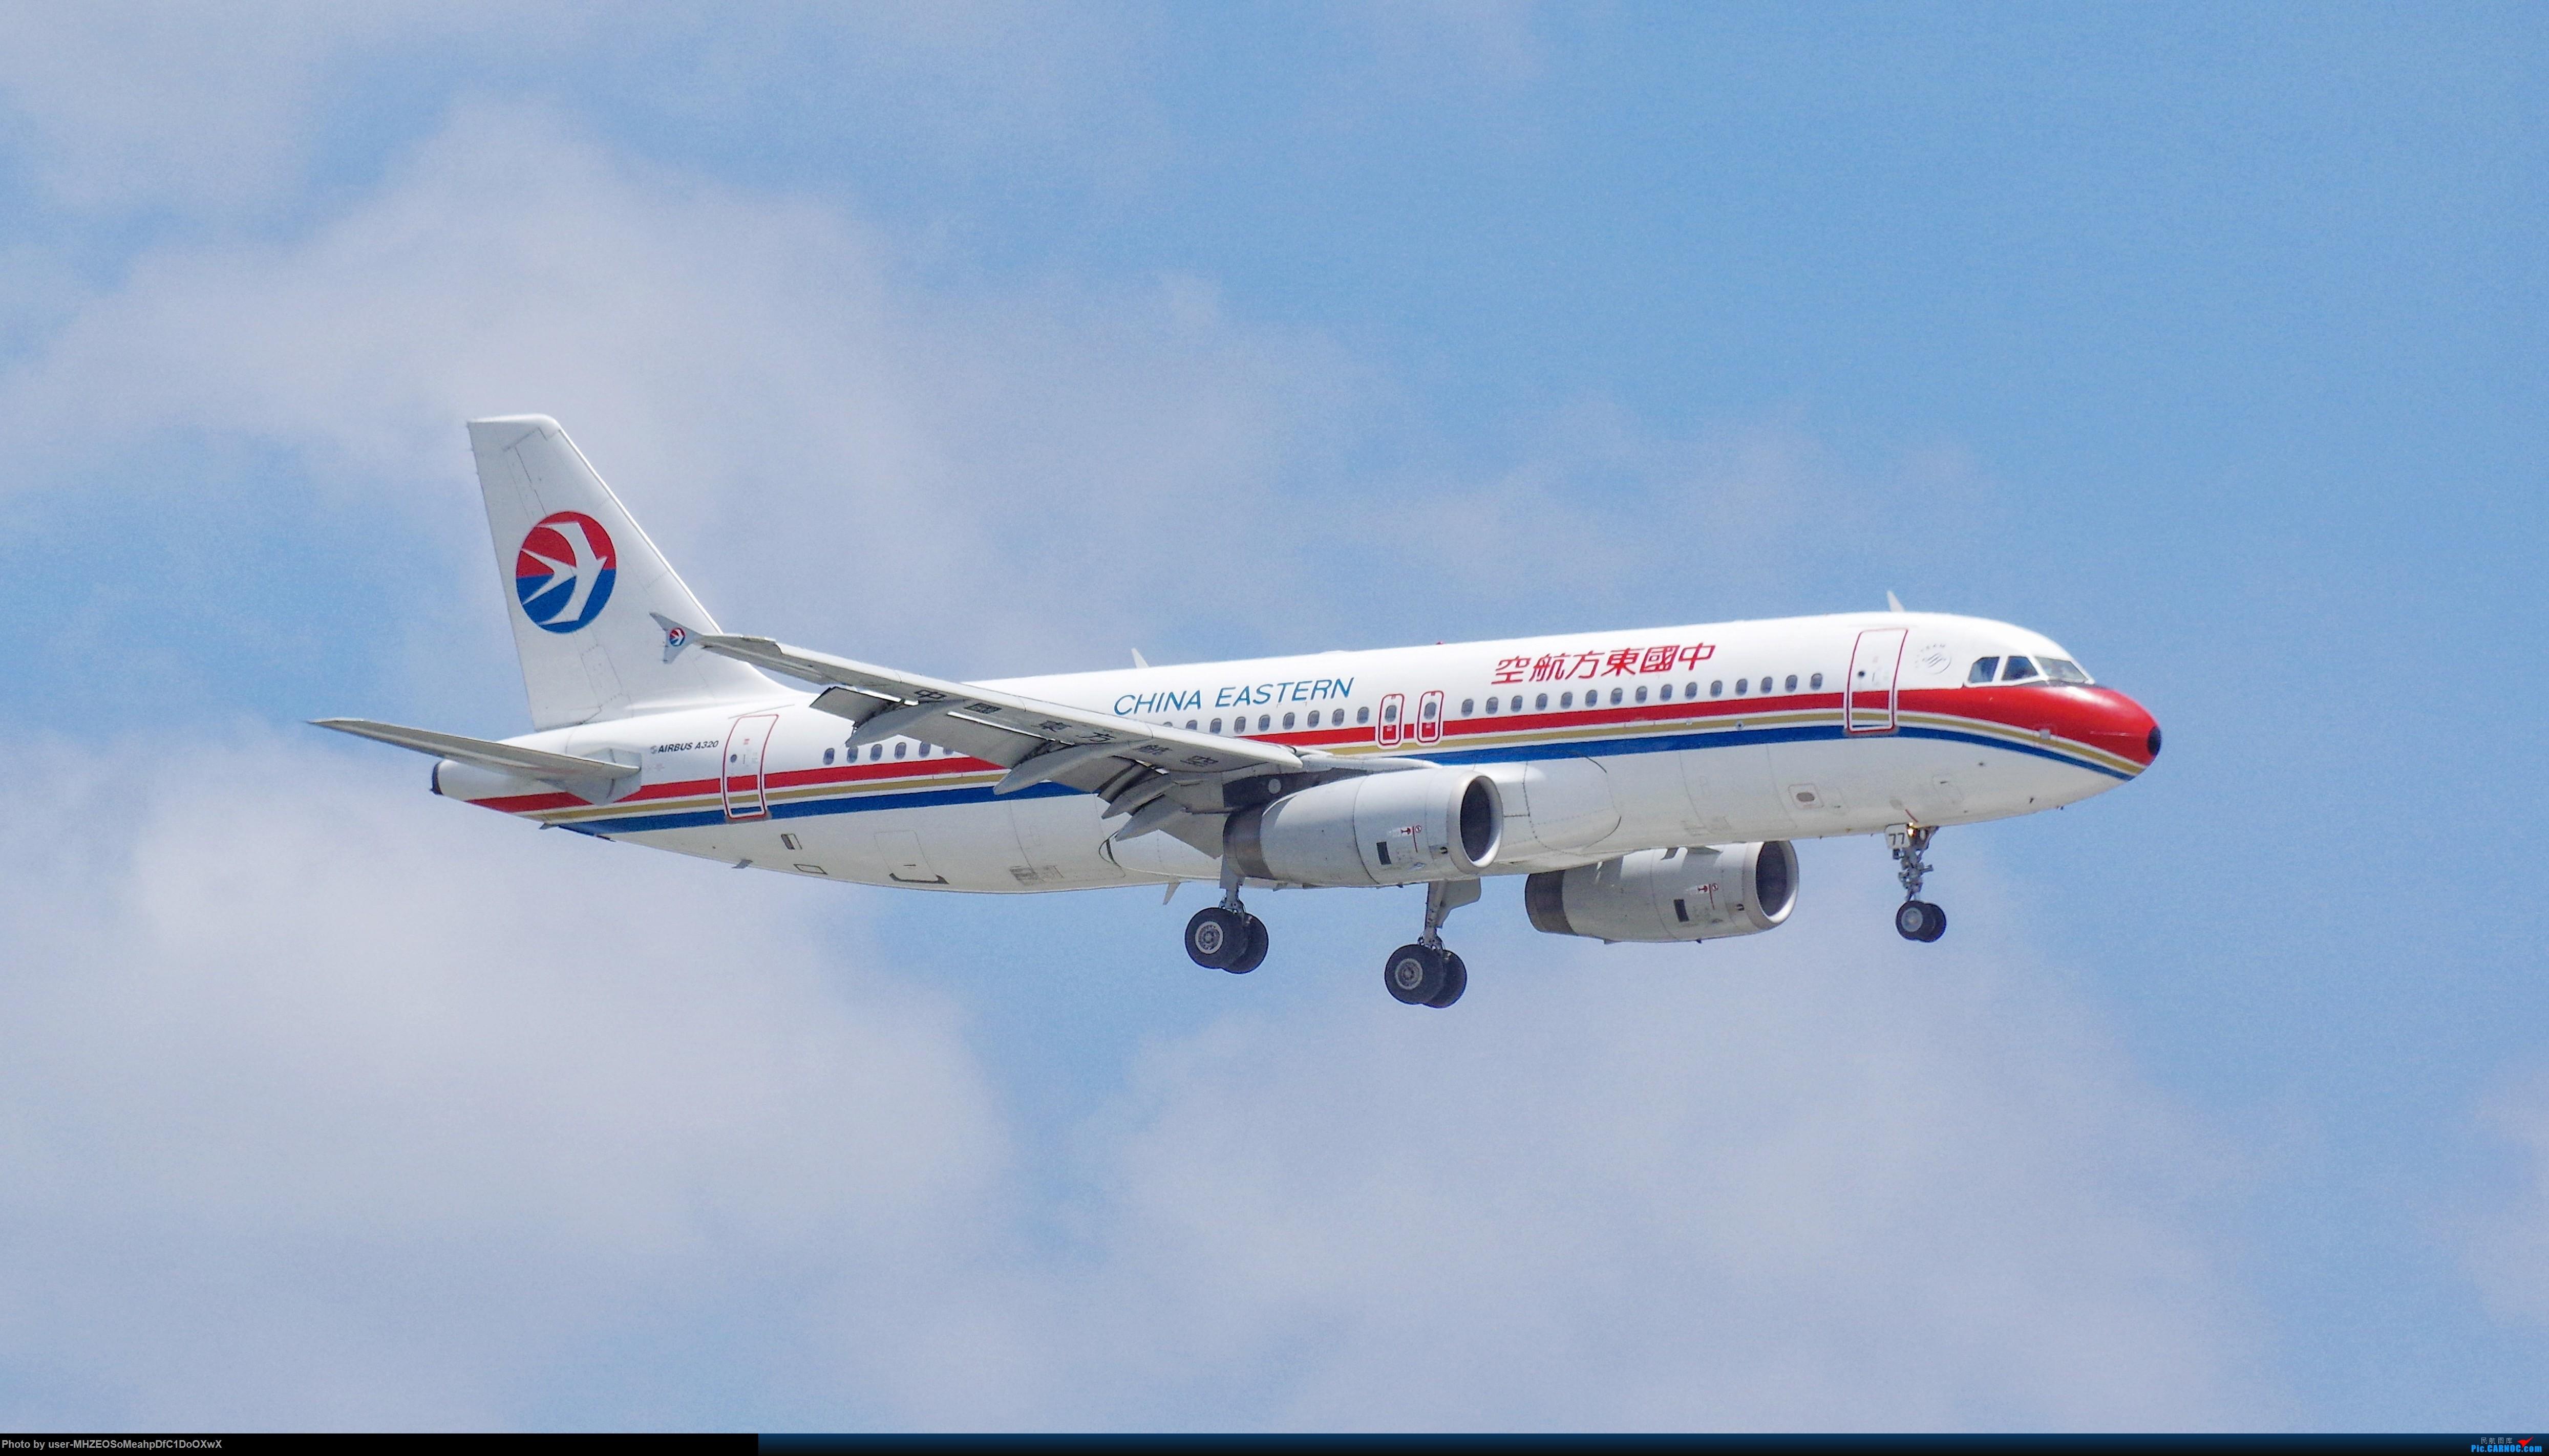 【SHA】中国东方航空 A320-200 老涂装 AIRBUS A320-200 B-6877 中国上海虹桥国际机场